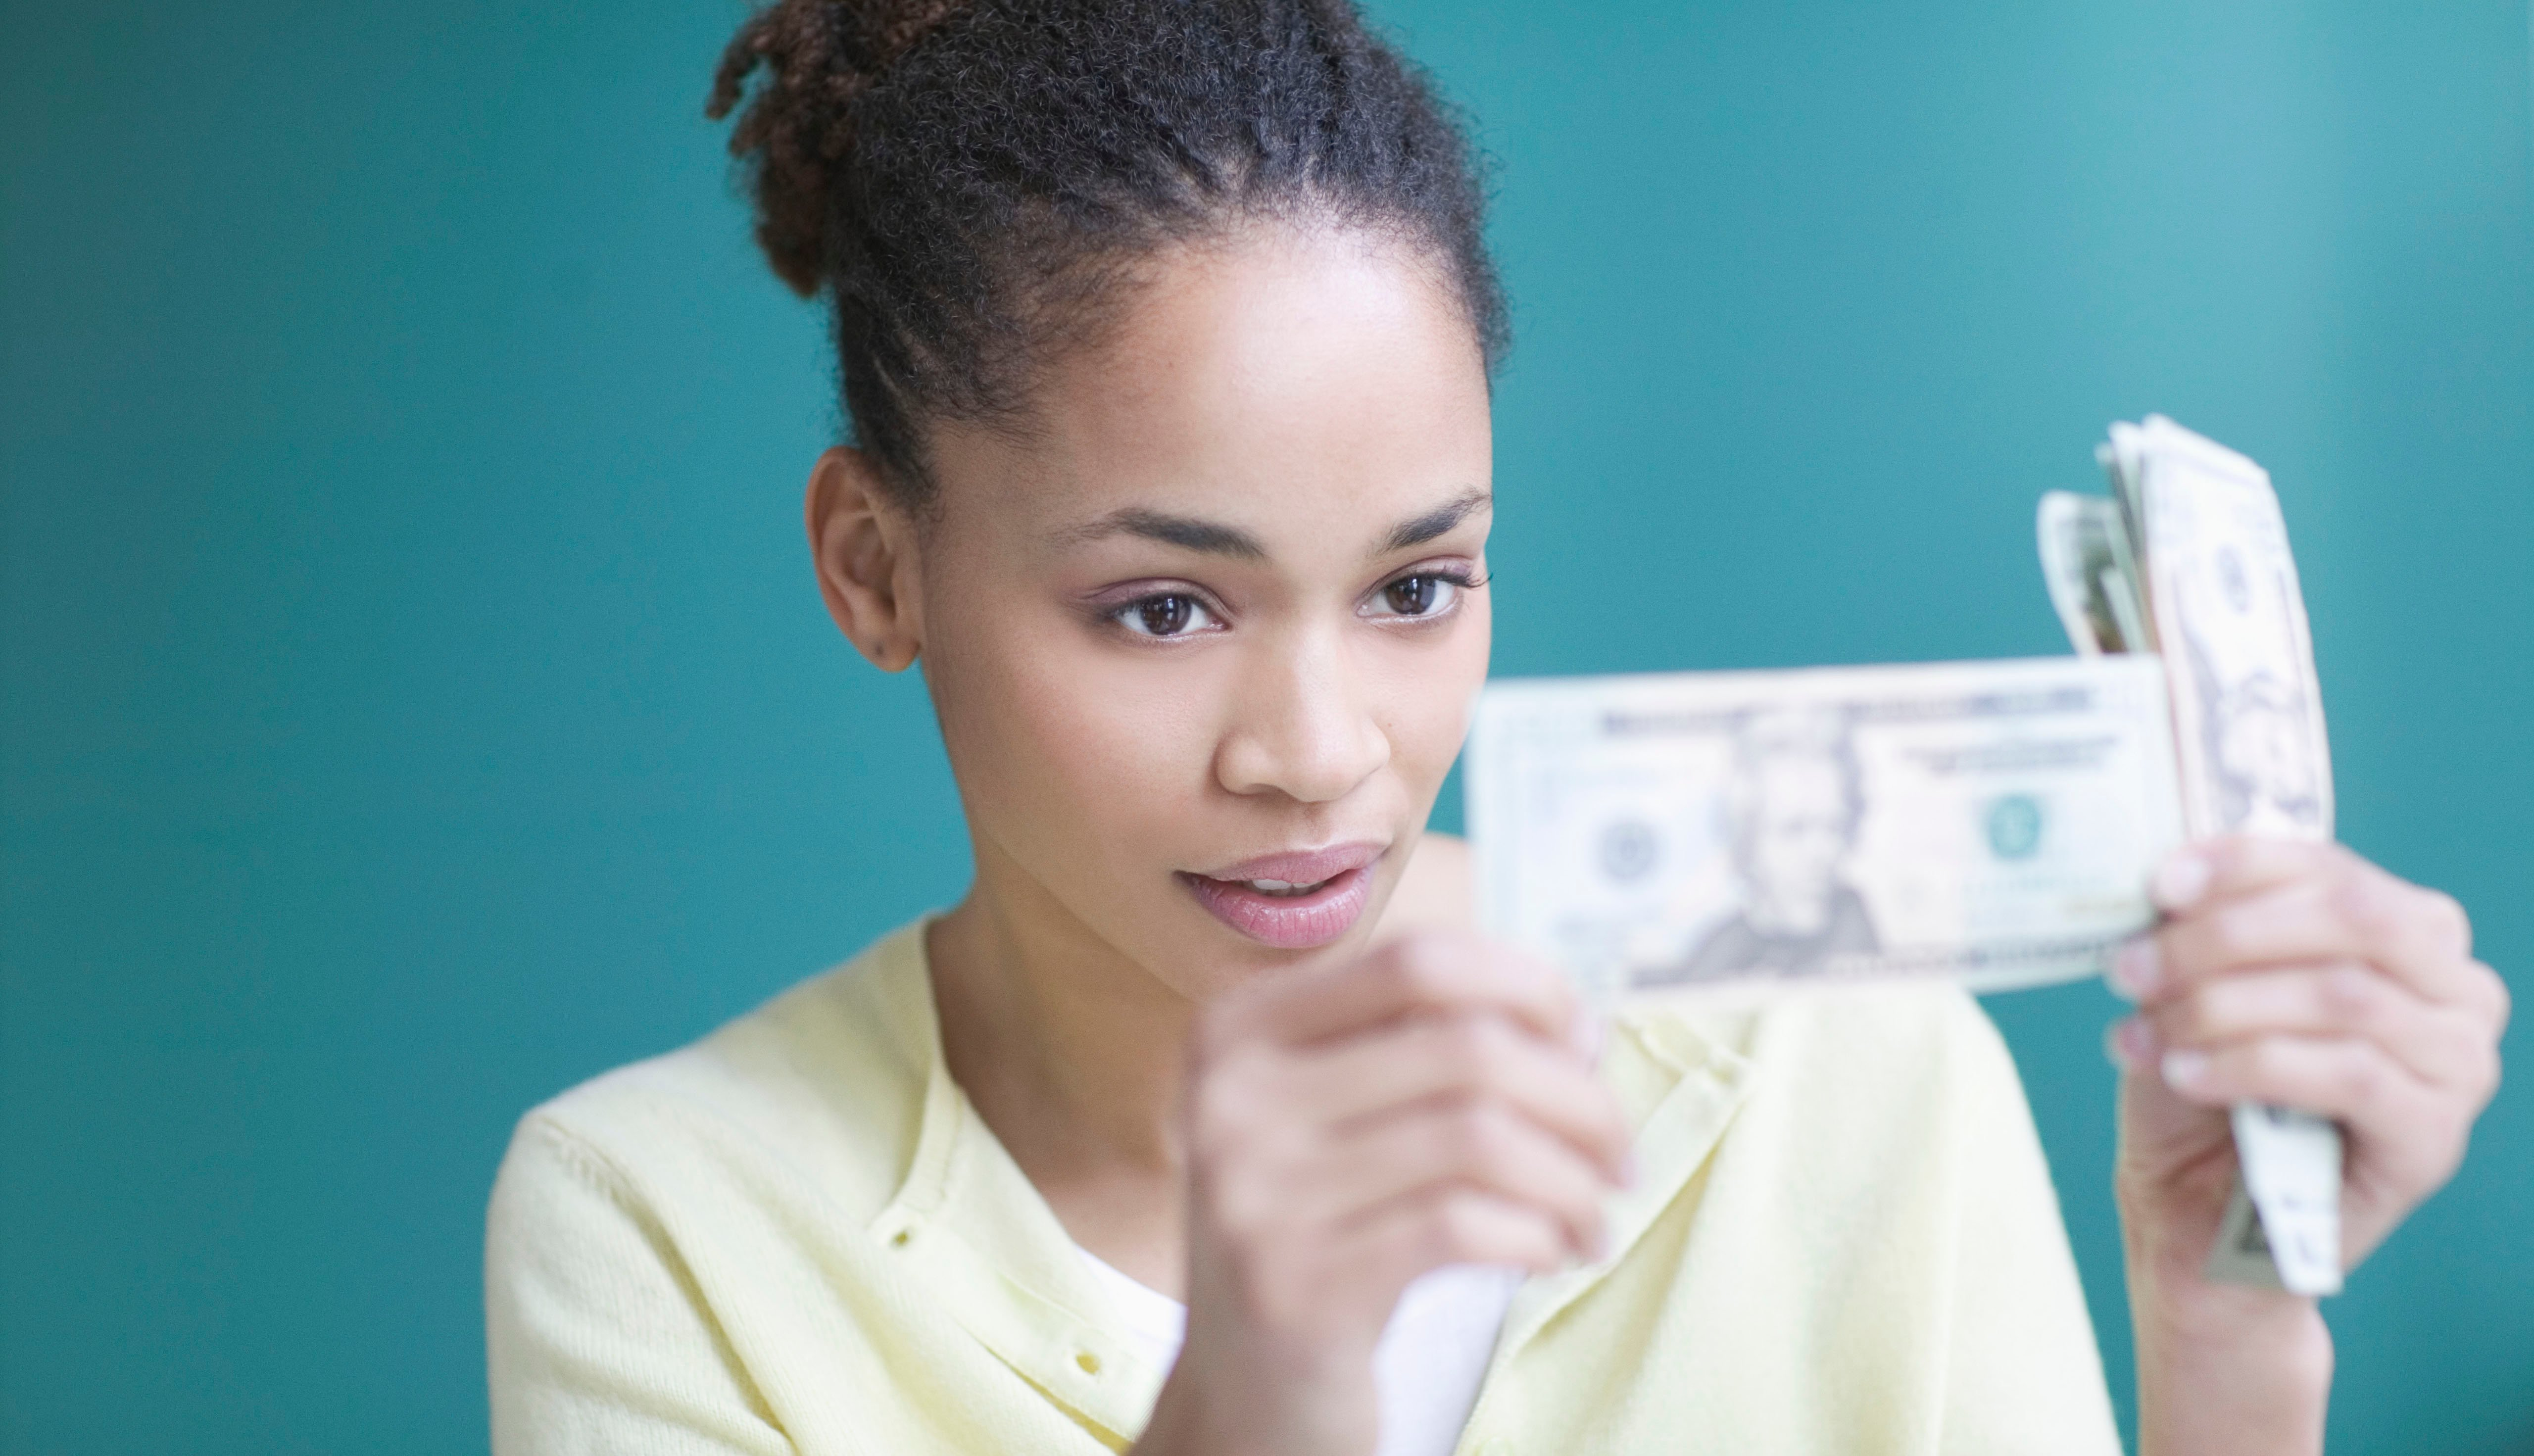 woman holding a dollar bill